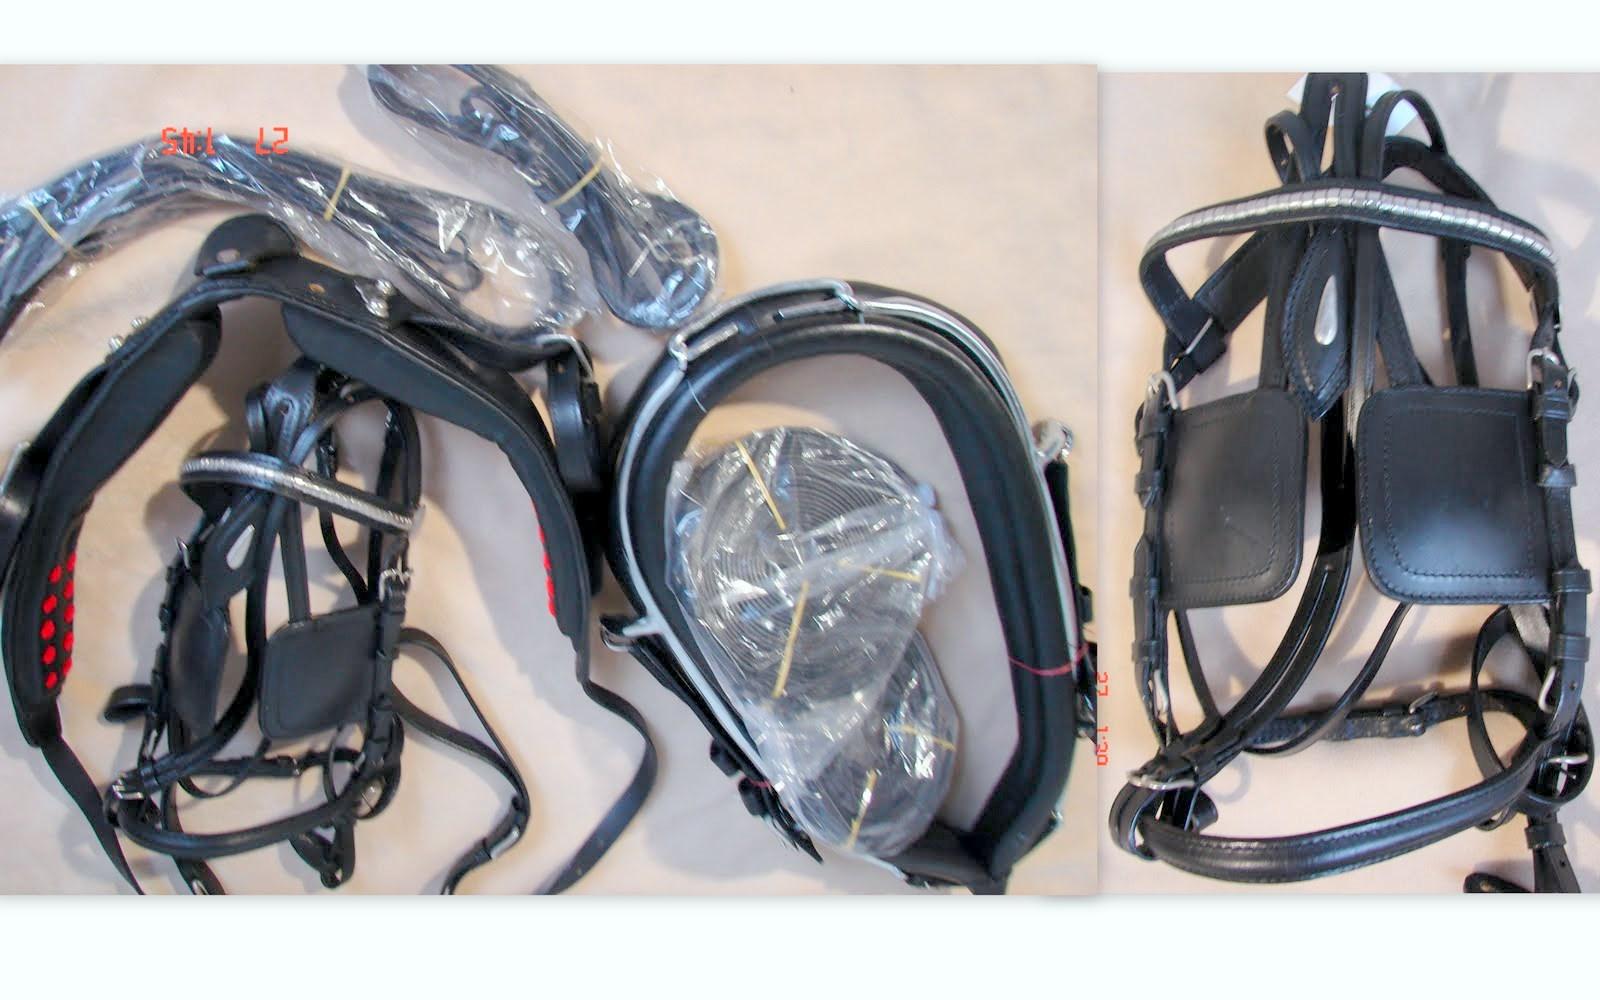 Leather Horse Yoke Harness Wiring Diagram